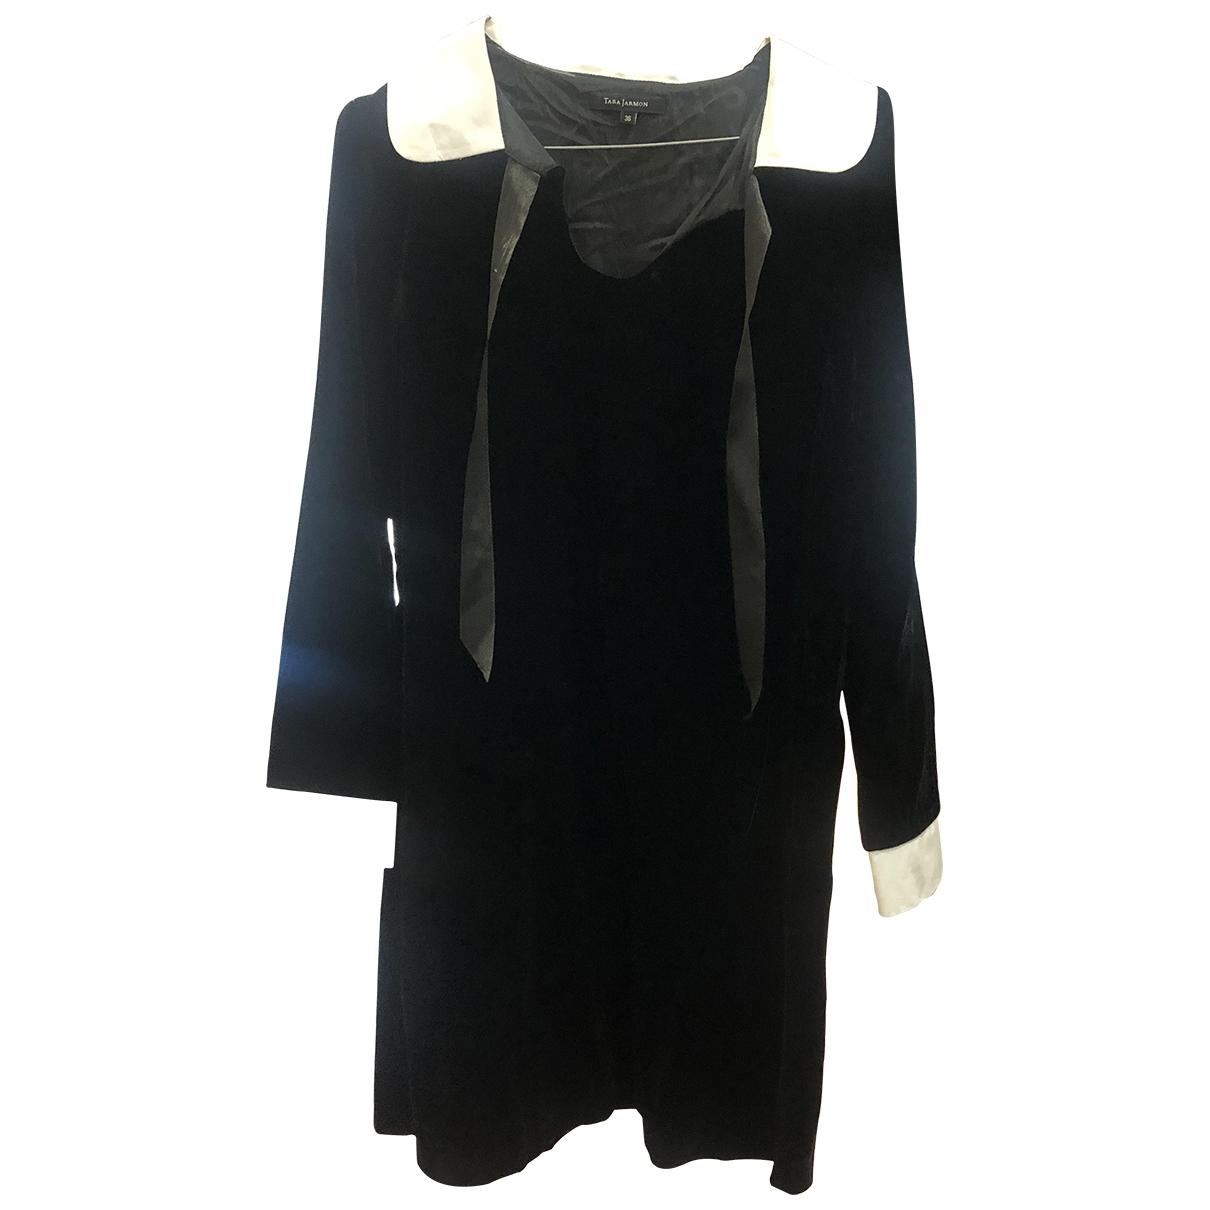 Tara Jarmon - Robe   pour femme en velours - noir